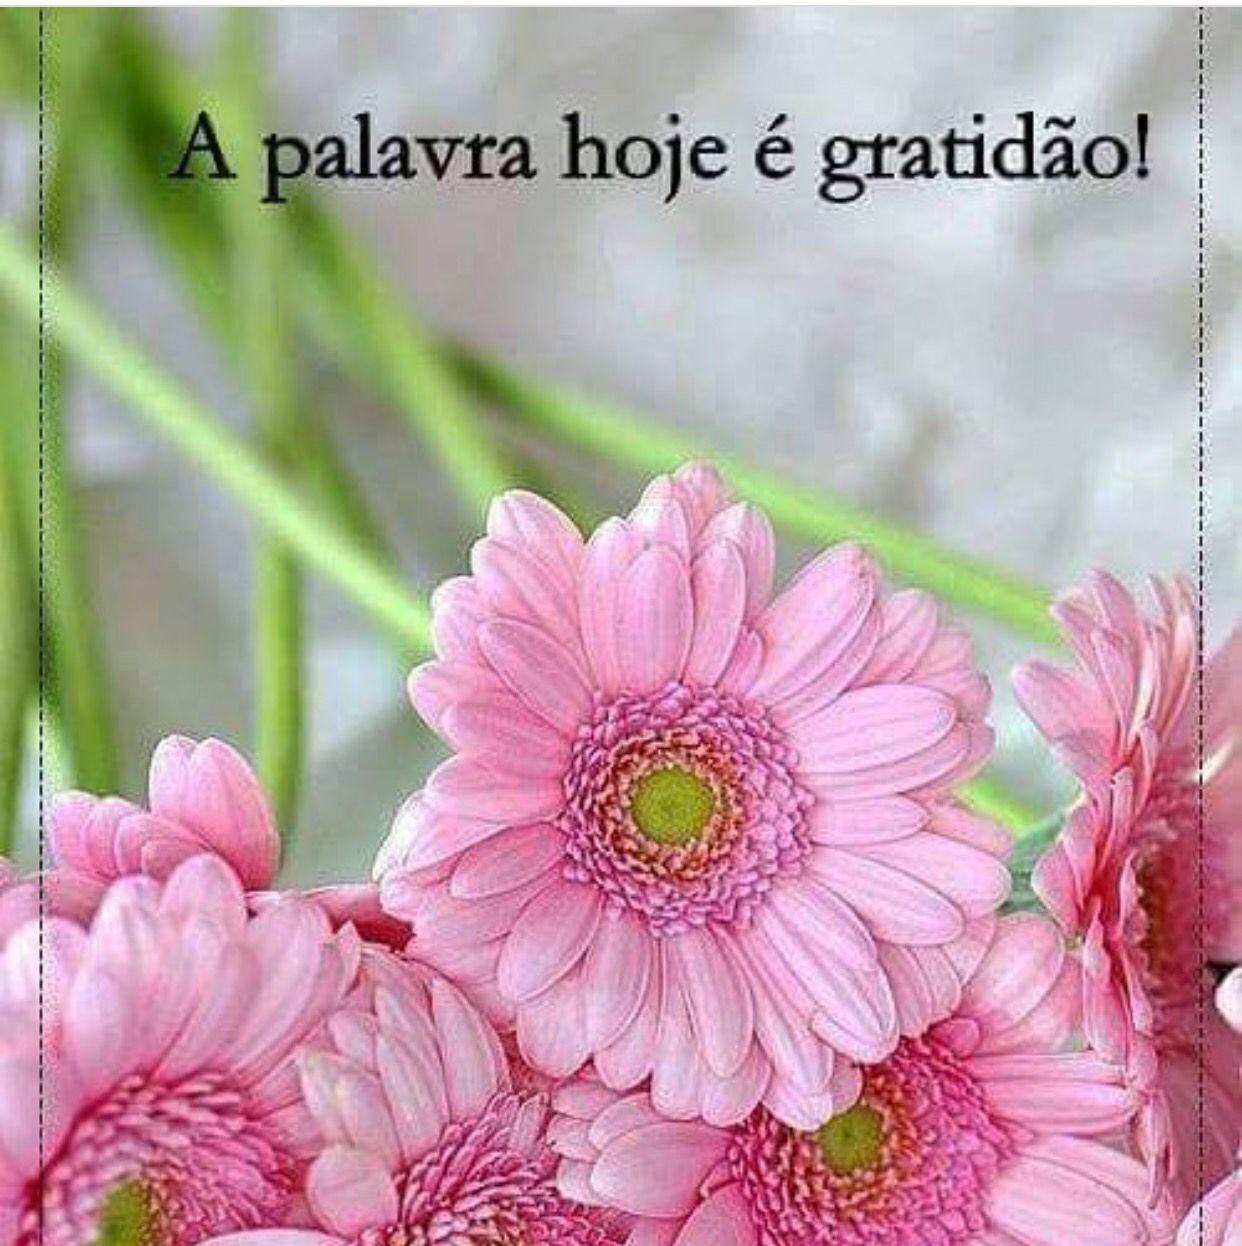 Pin von Tanya auf Bom Dia ☼ | Pinterest